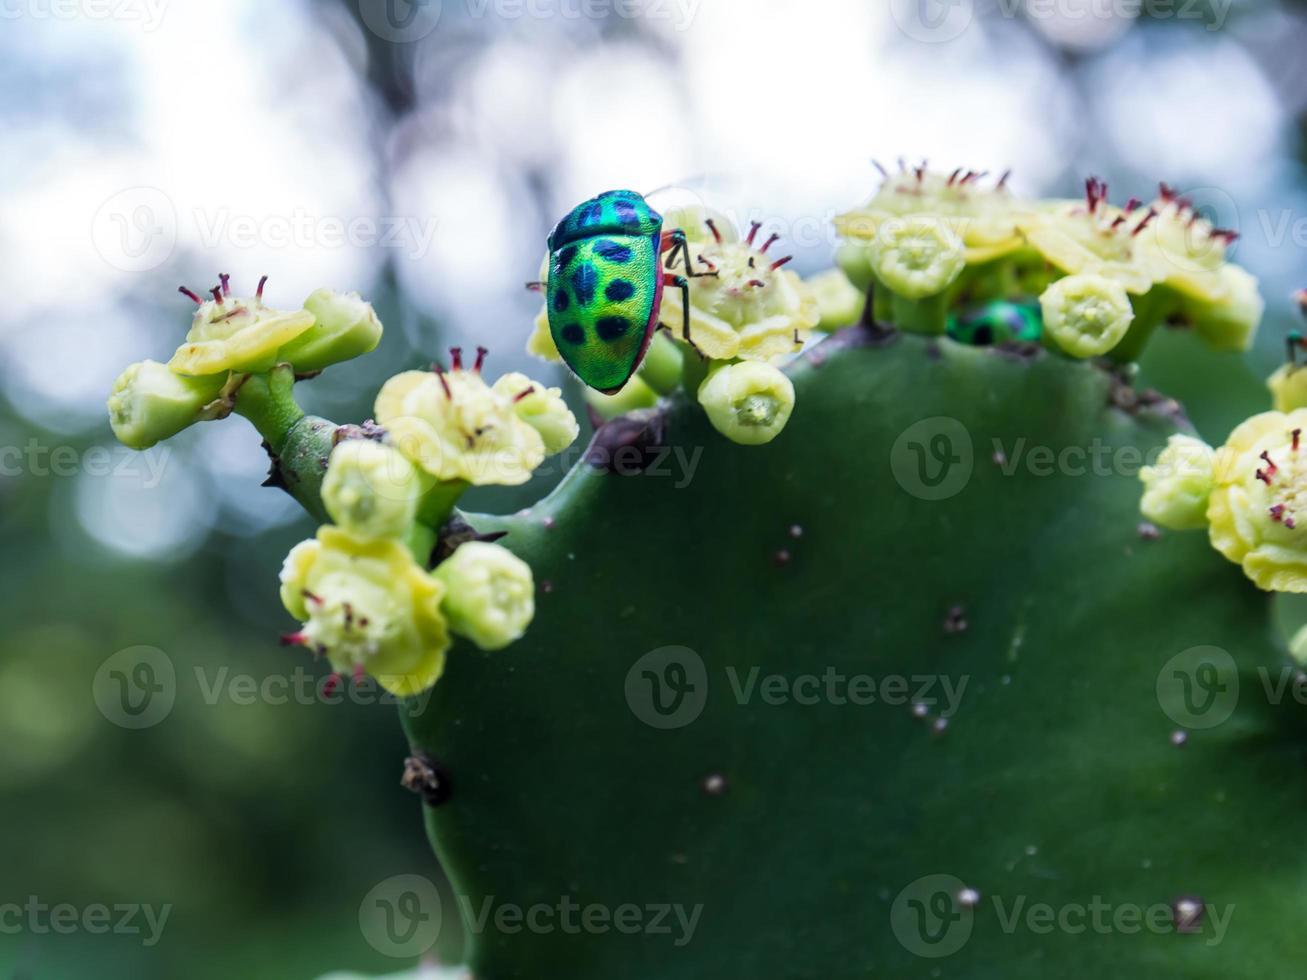 besouro joia bug nas flores de cacto de pera espinhosa foto